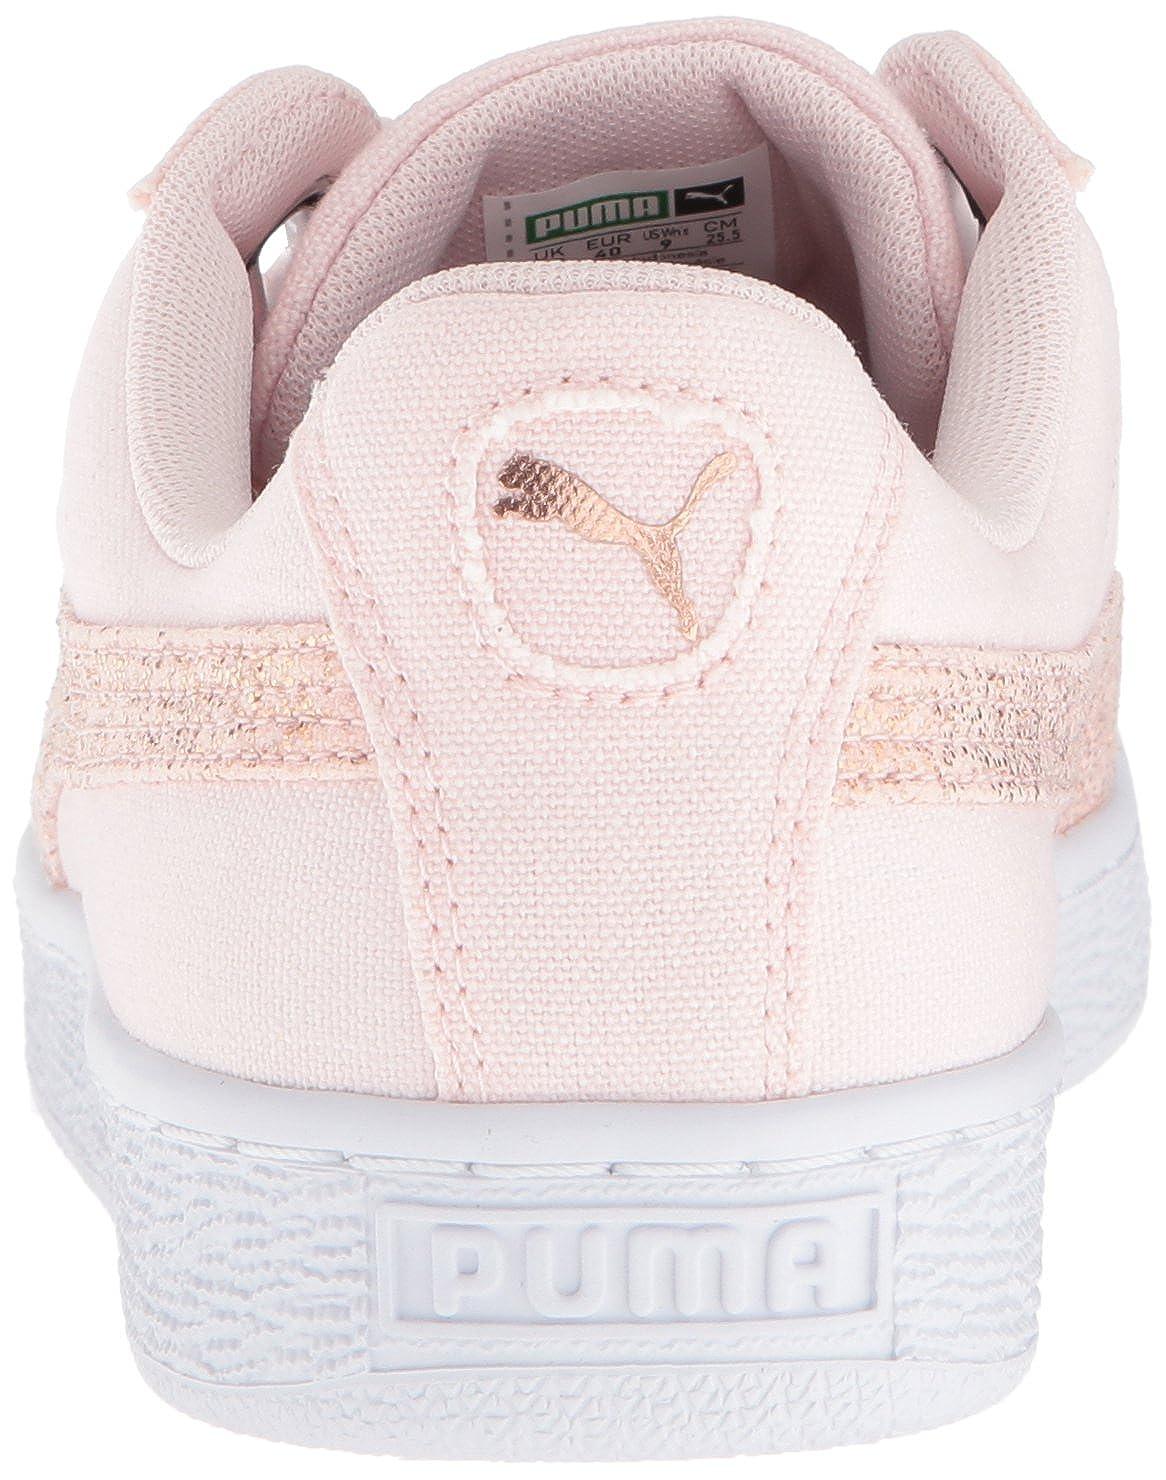 PUMA PUMA PUMA Damens's Basket Heart Canvas Wn Sneaker, Pearl Weiß-Rose Gold, 9.5 M US - 0a4902